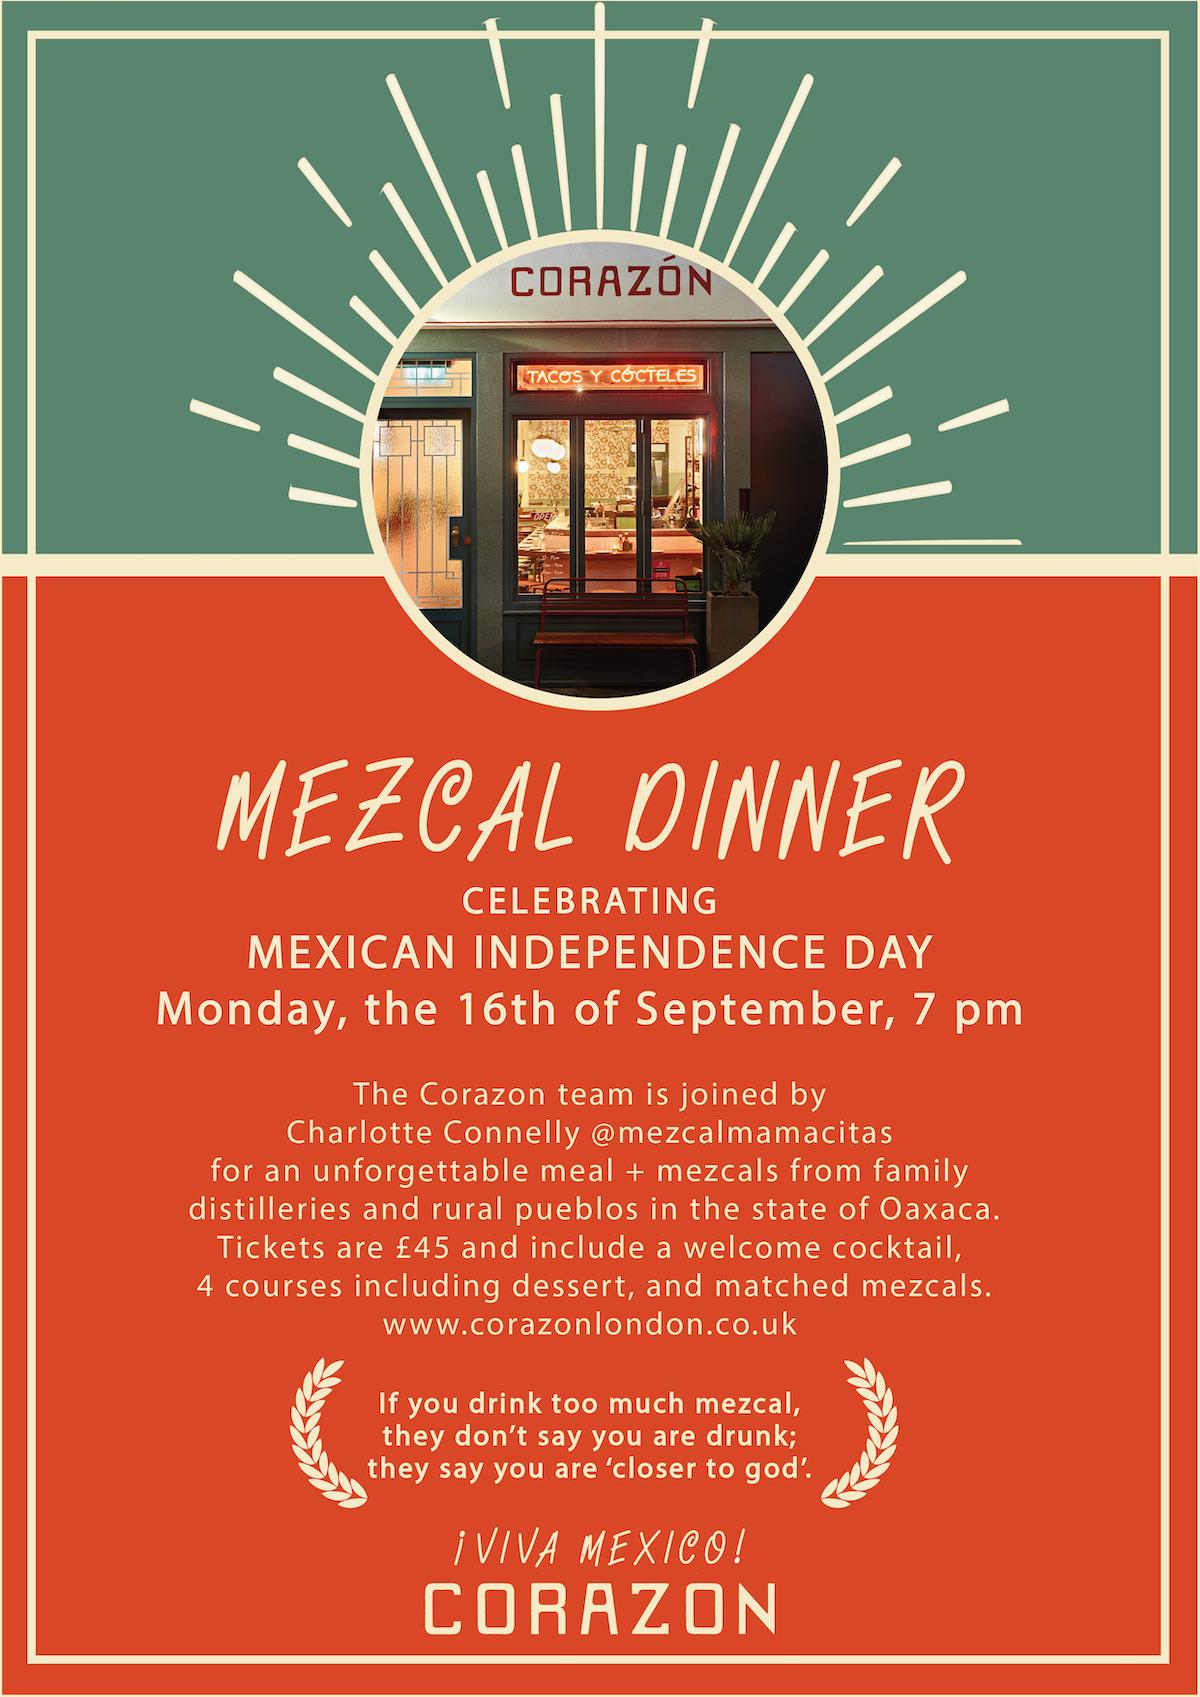 Mezcal Dinner-01 copy.png